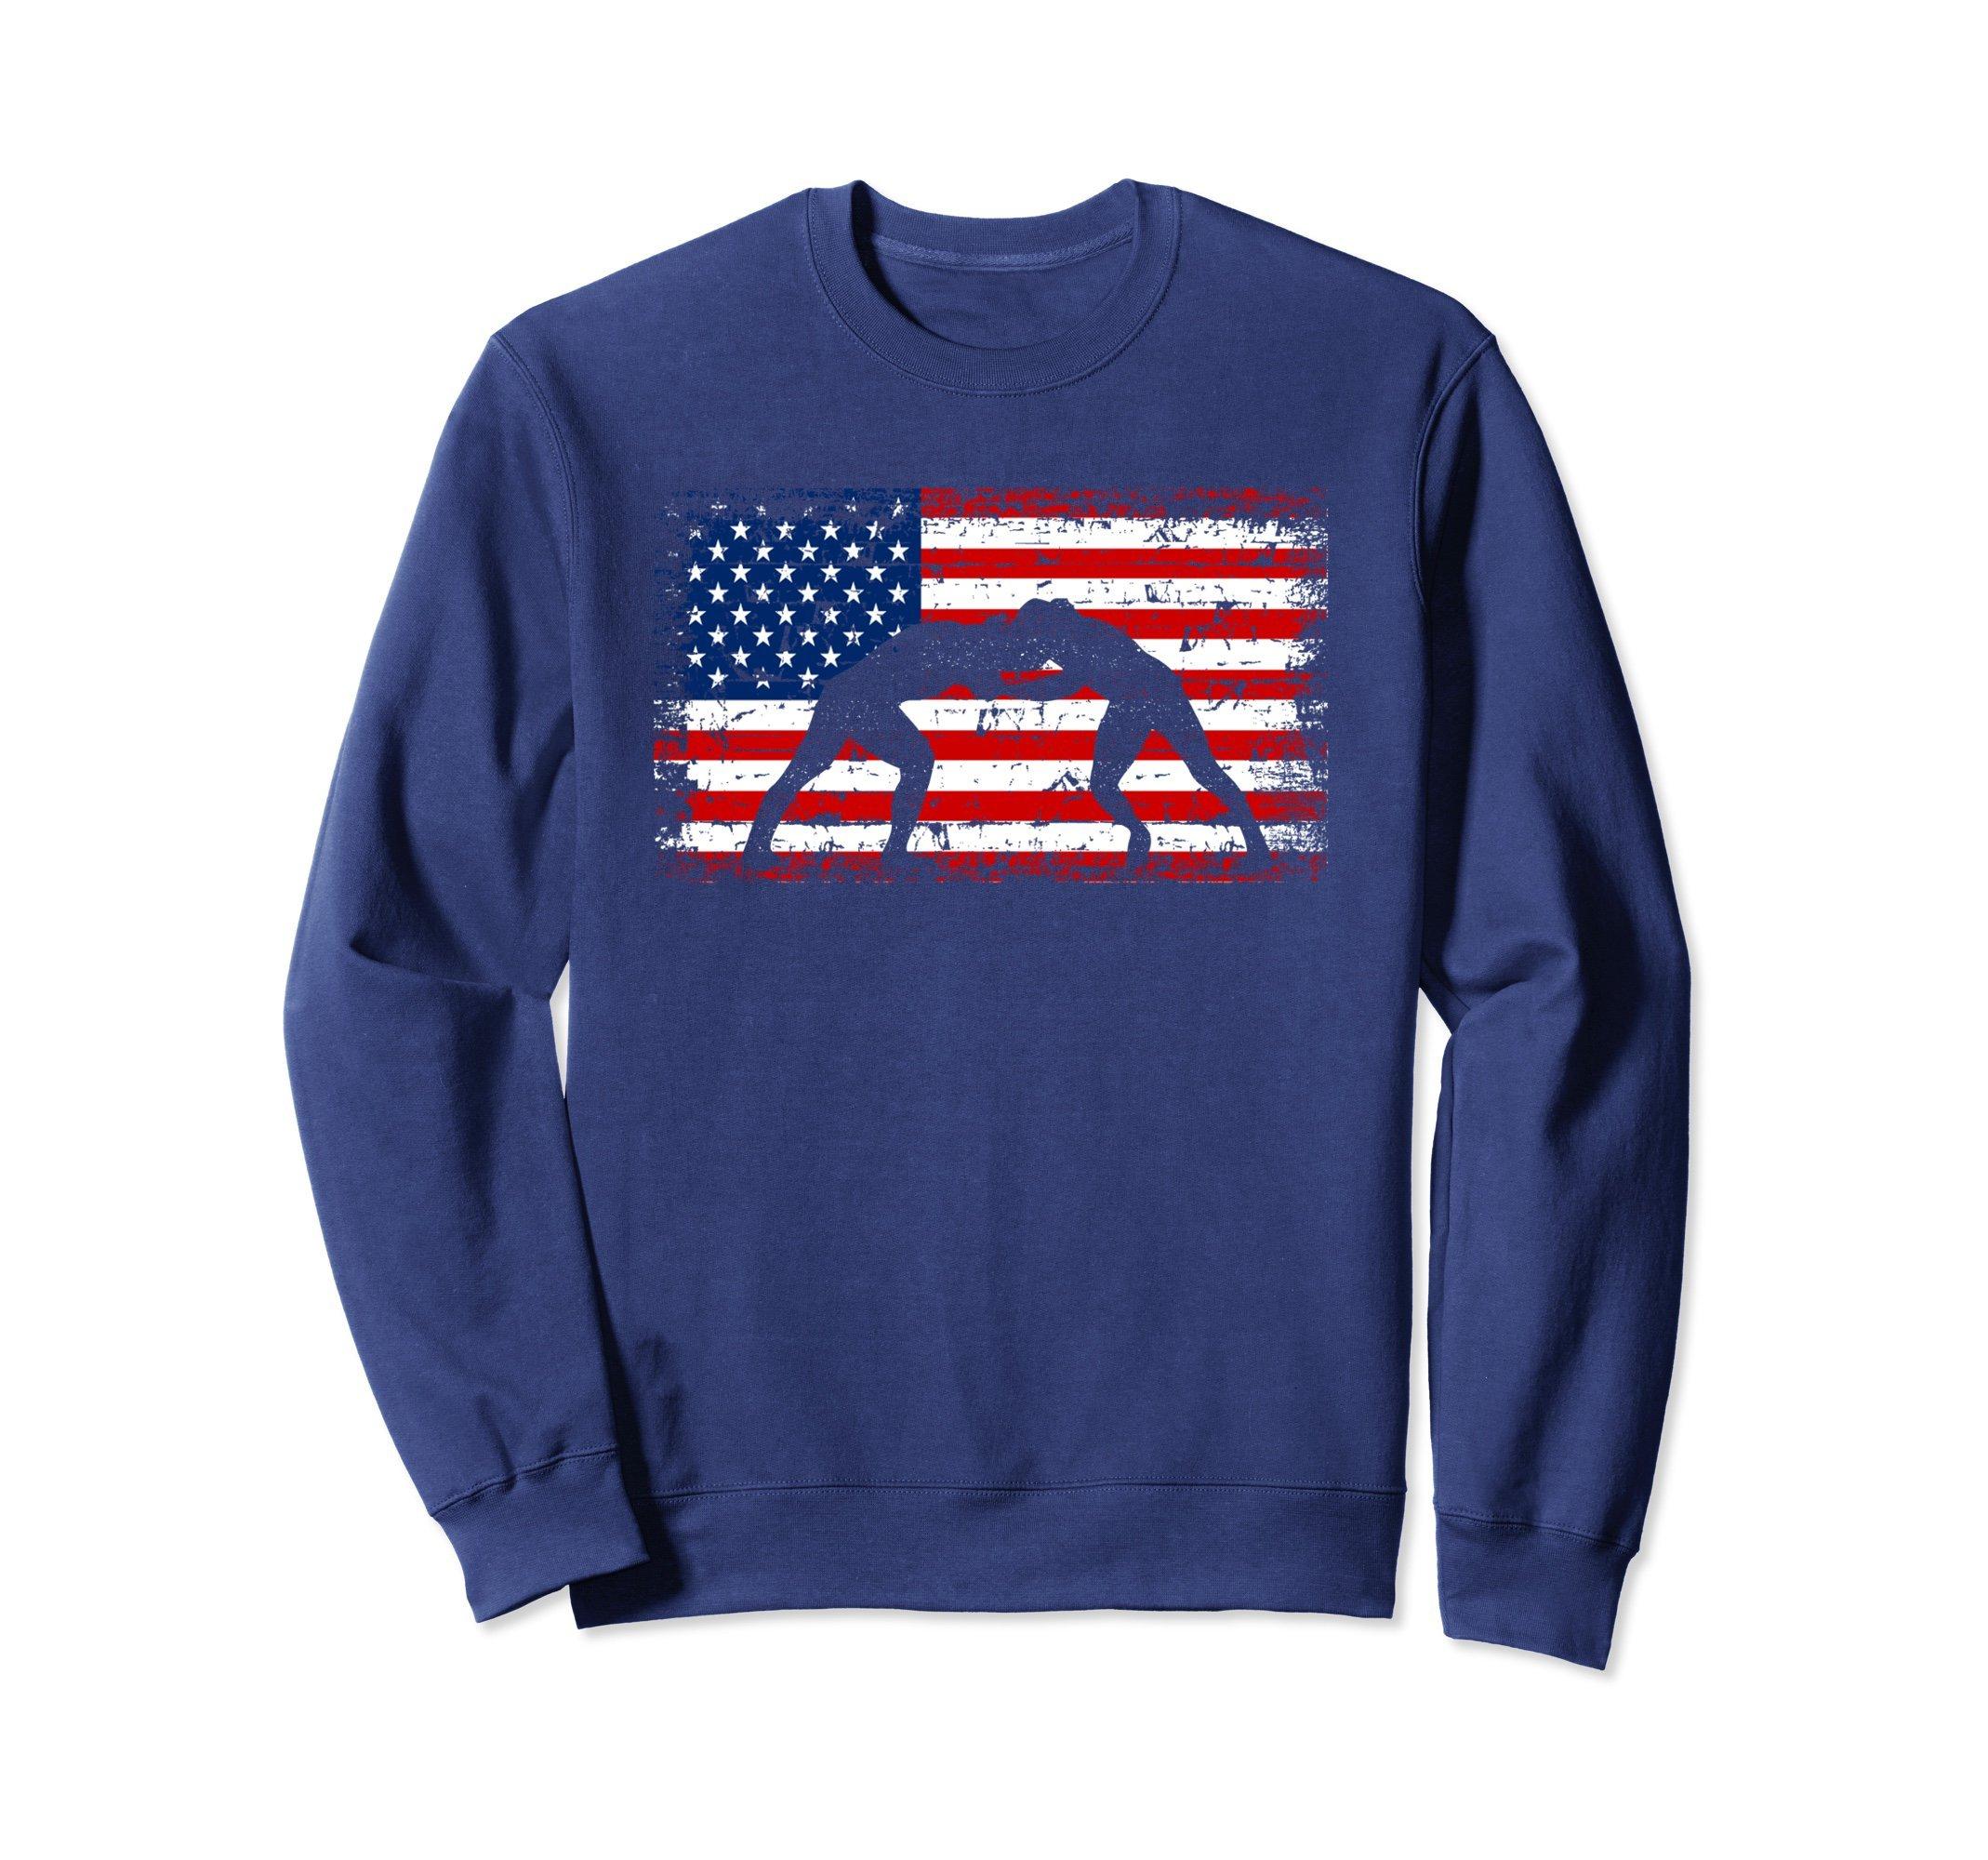 Unisex Wrestling American flag Wrestlers Sweatshirt XL: Navy